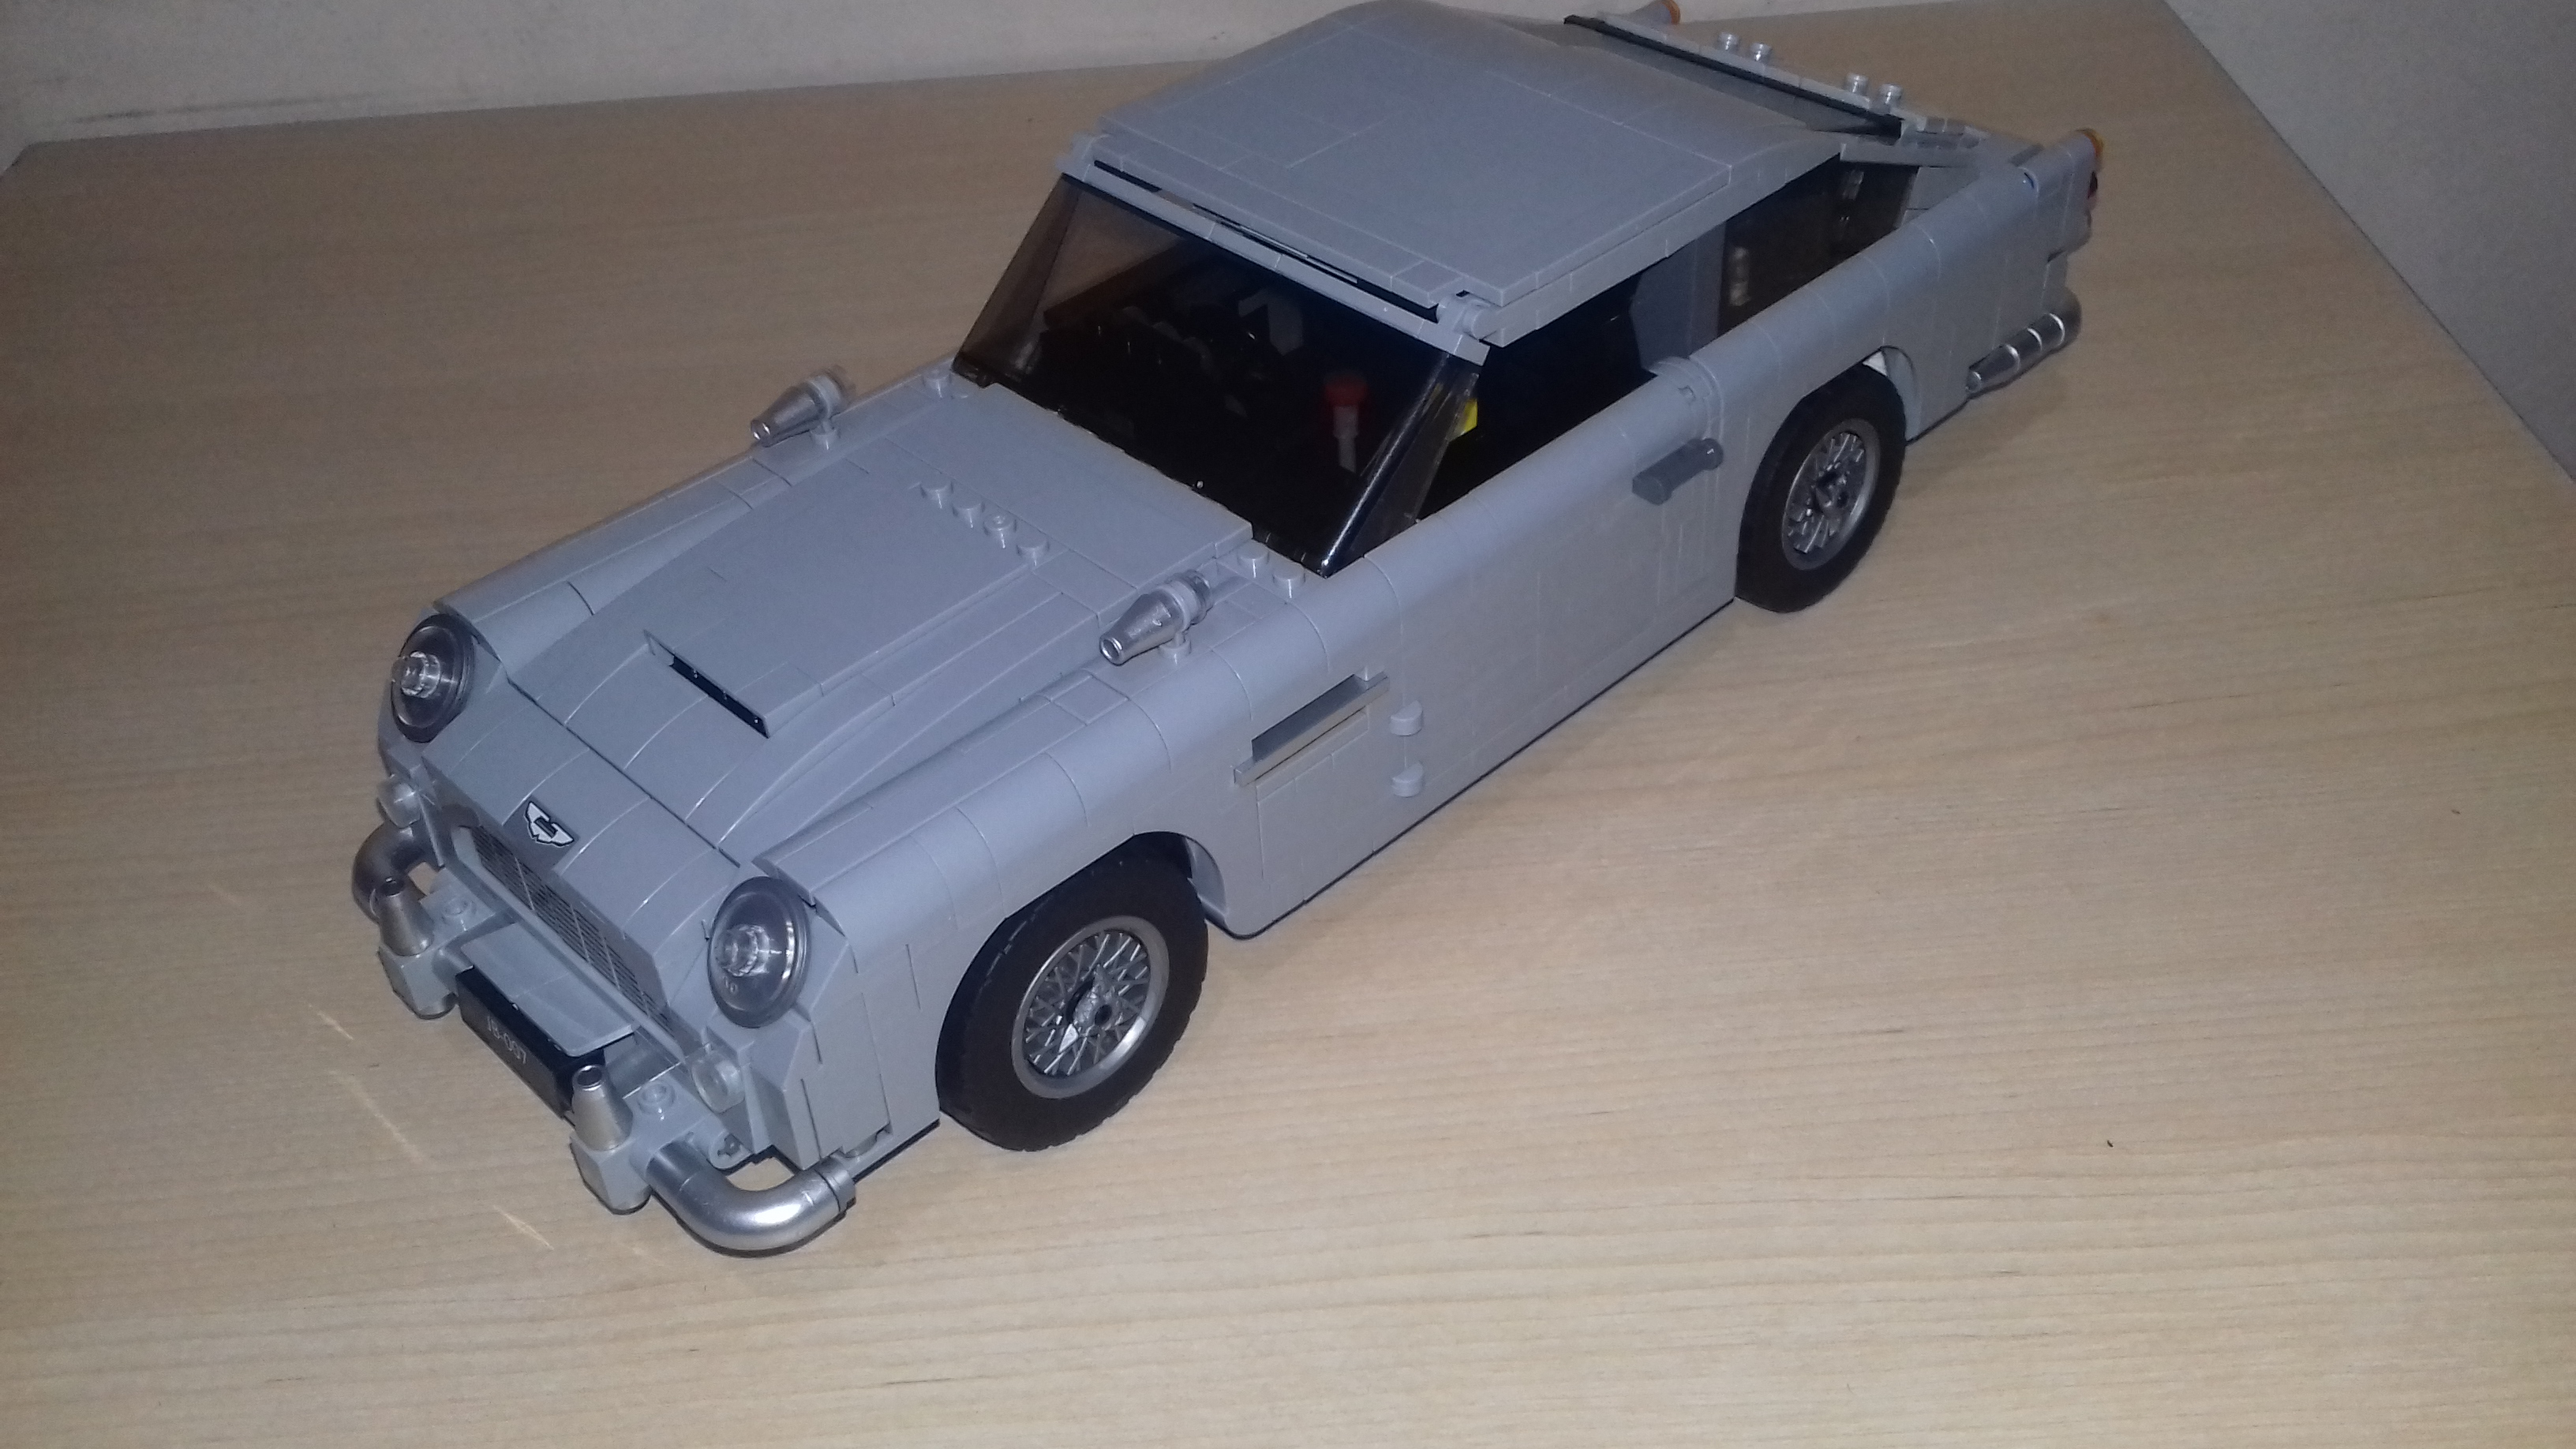 LEPIN 21046 Aston Martin DB5 Block Set (1450Pcs) photo review